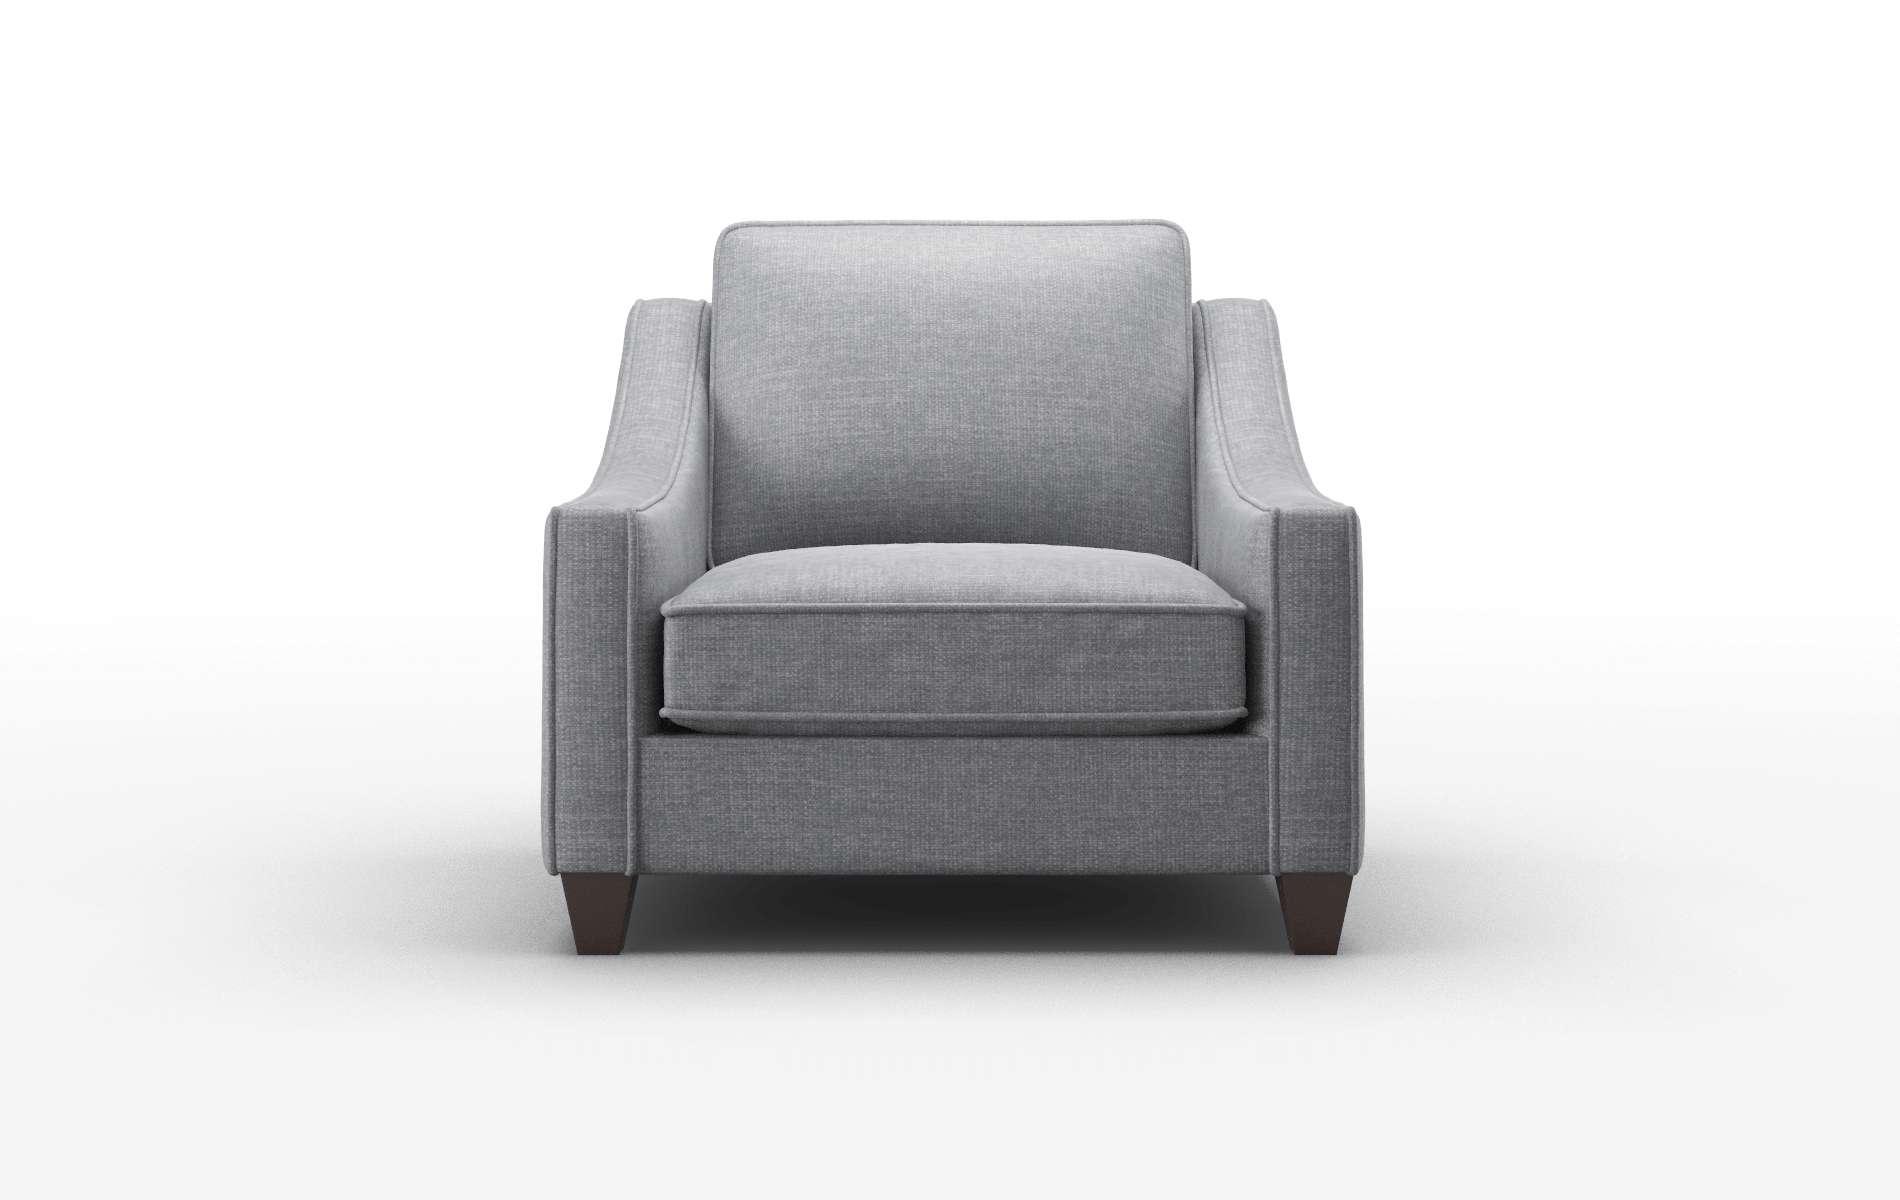 Sanda Keylargo Graphite Chair espresso legs 1